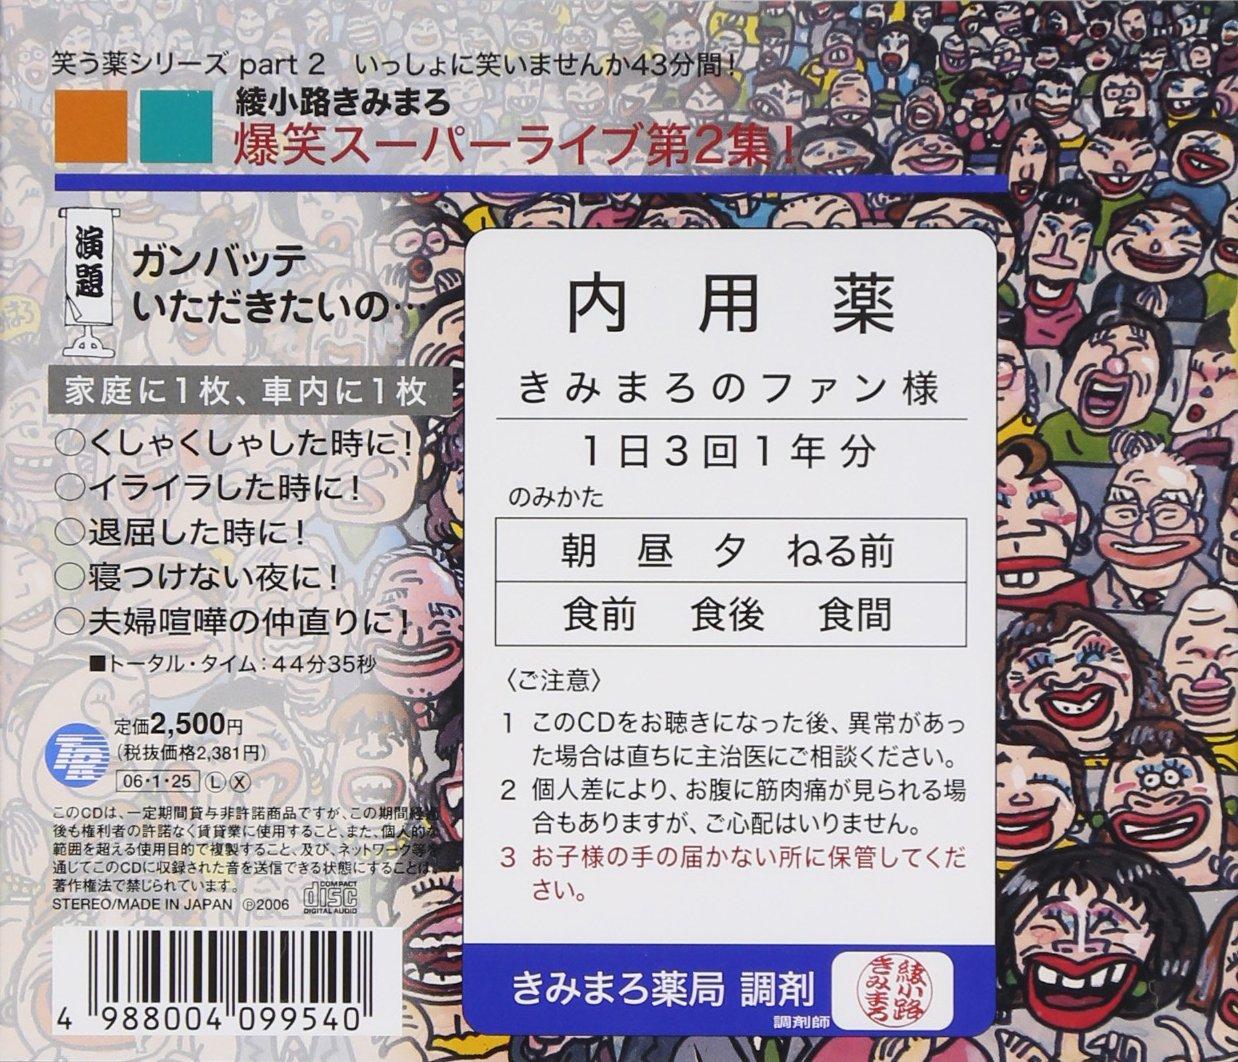 Akusyo Super Live 2